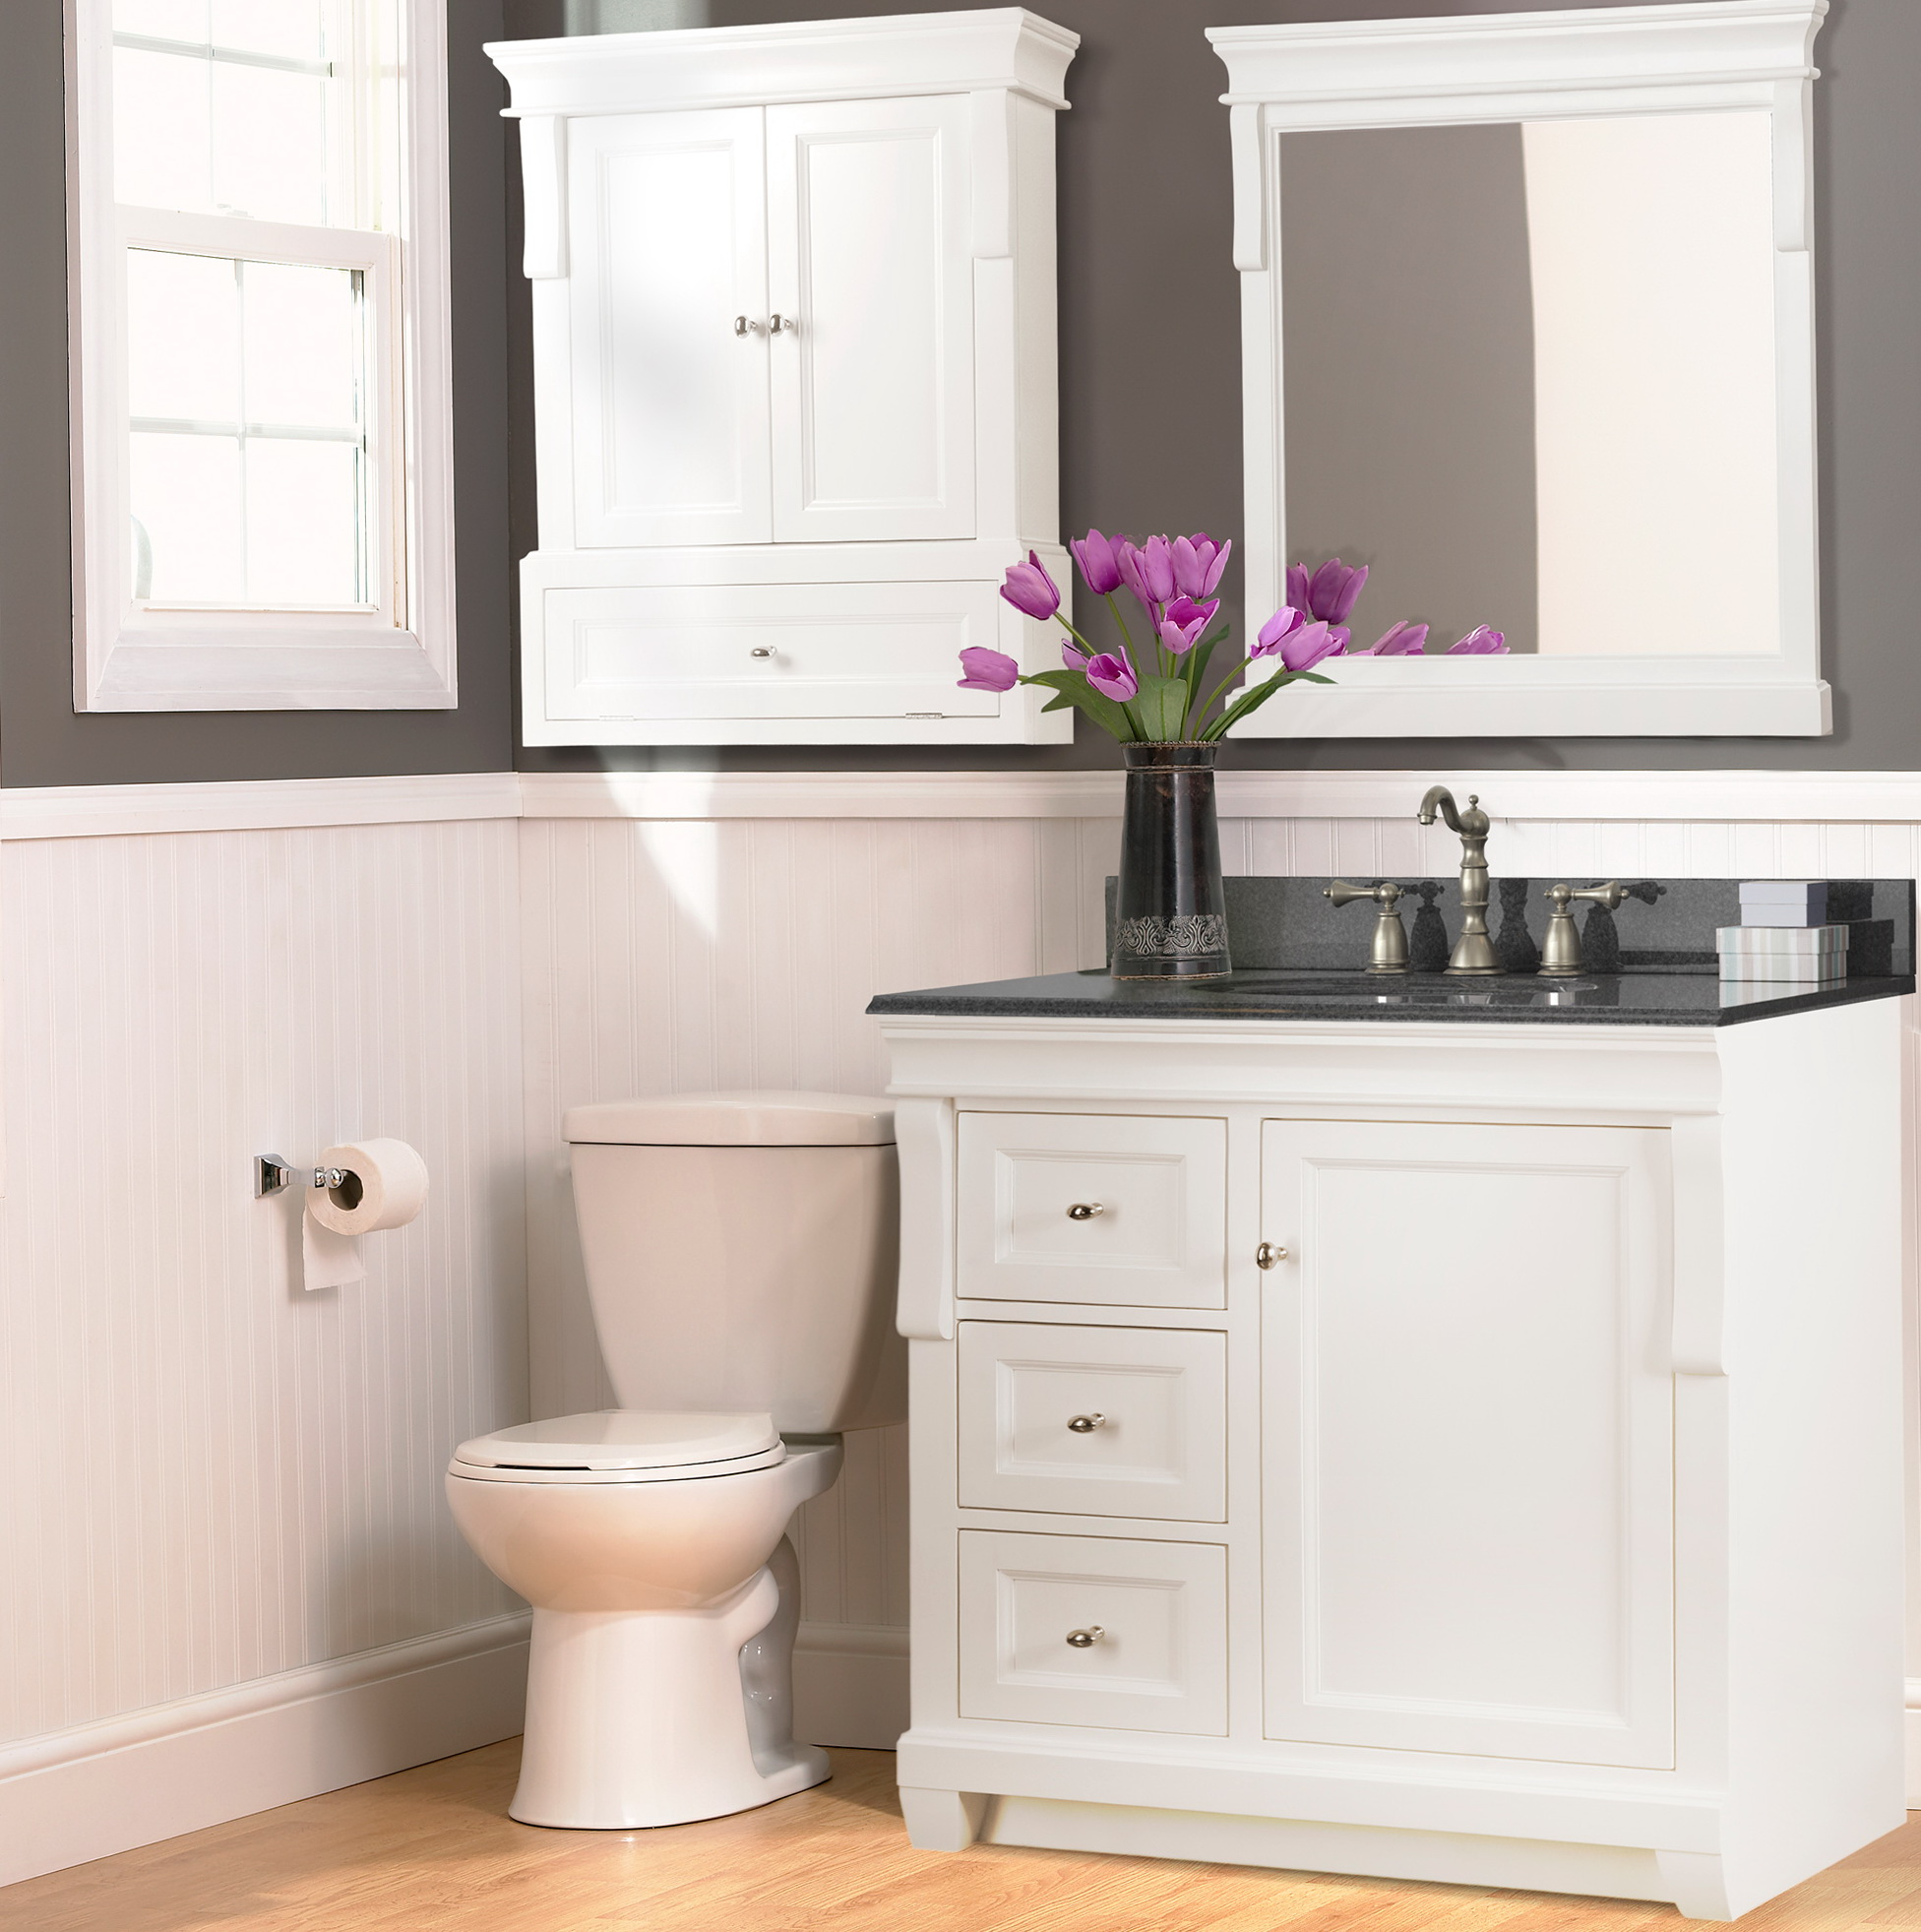 30 Inch Bathroom Vanity Home Depot